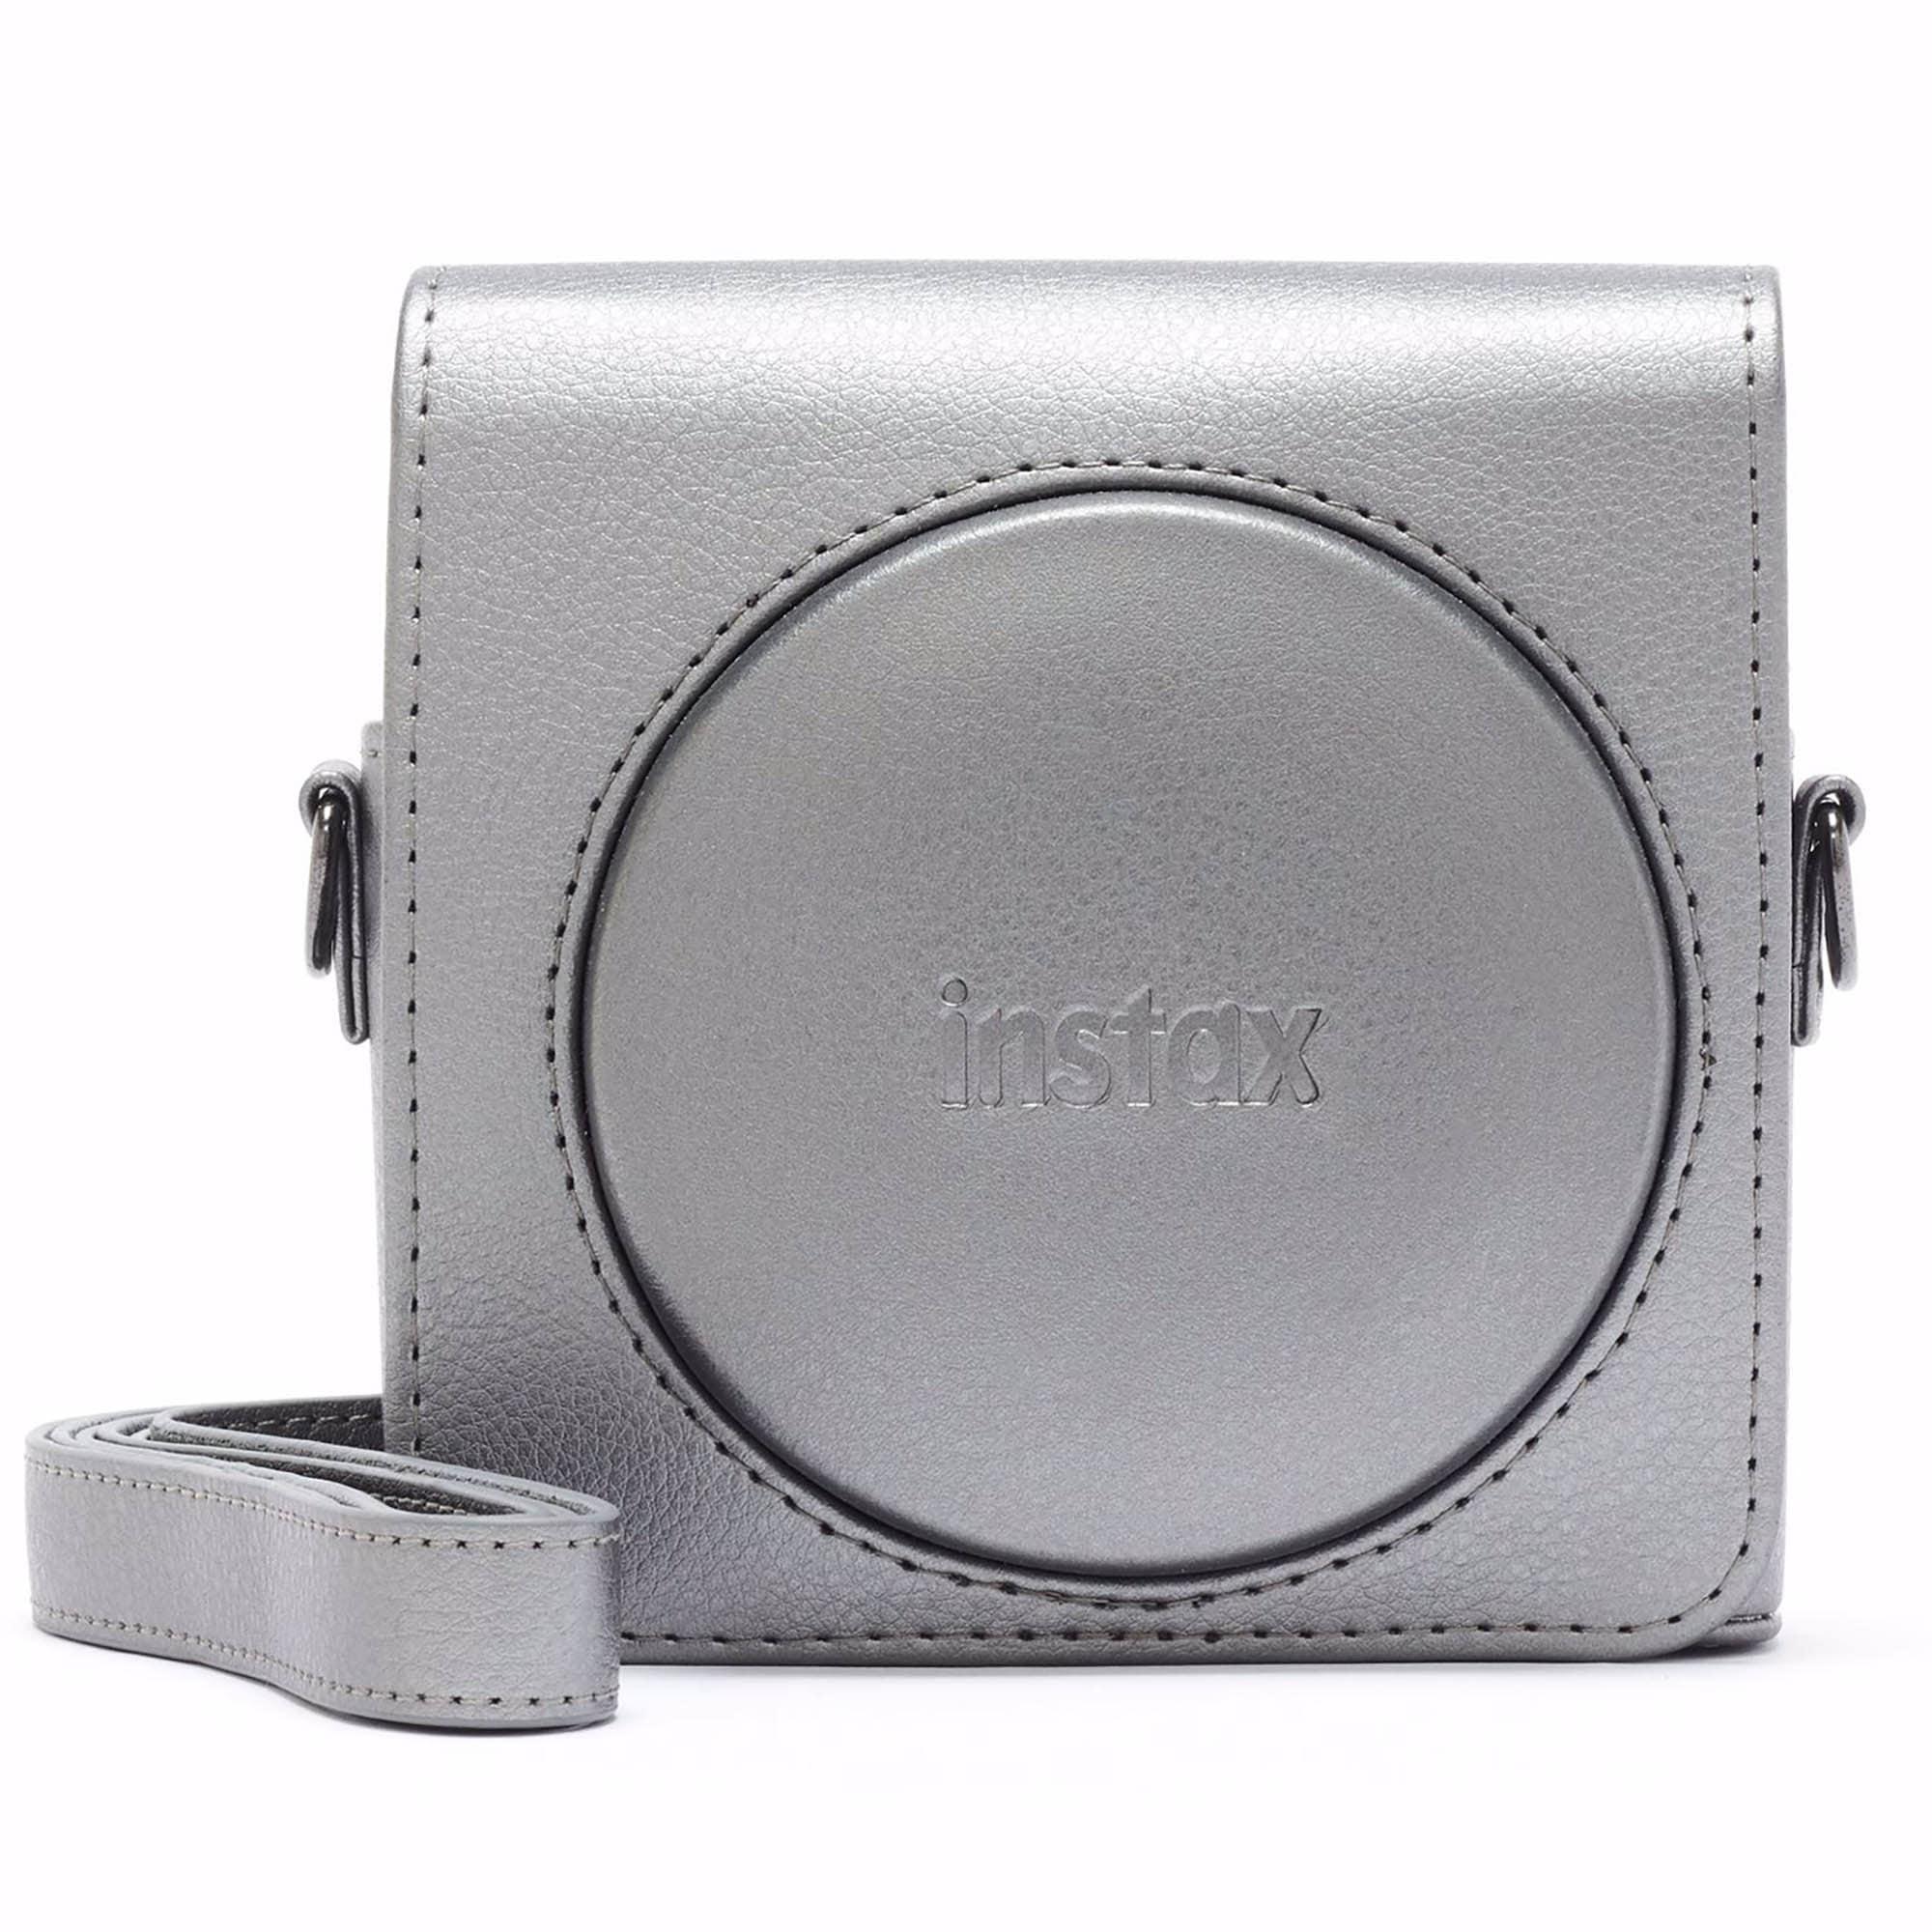 Fujifilm Instax SQ 6 Väska Graphite